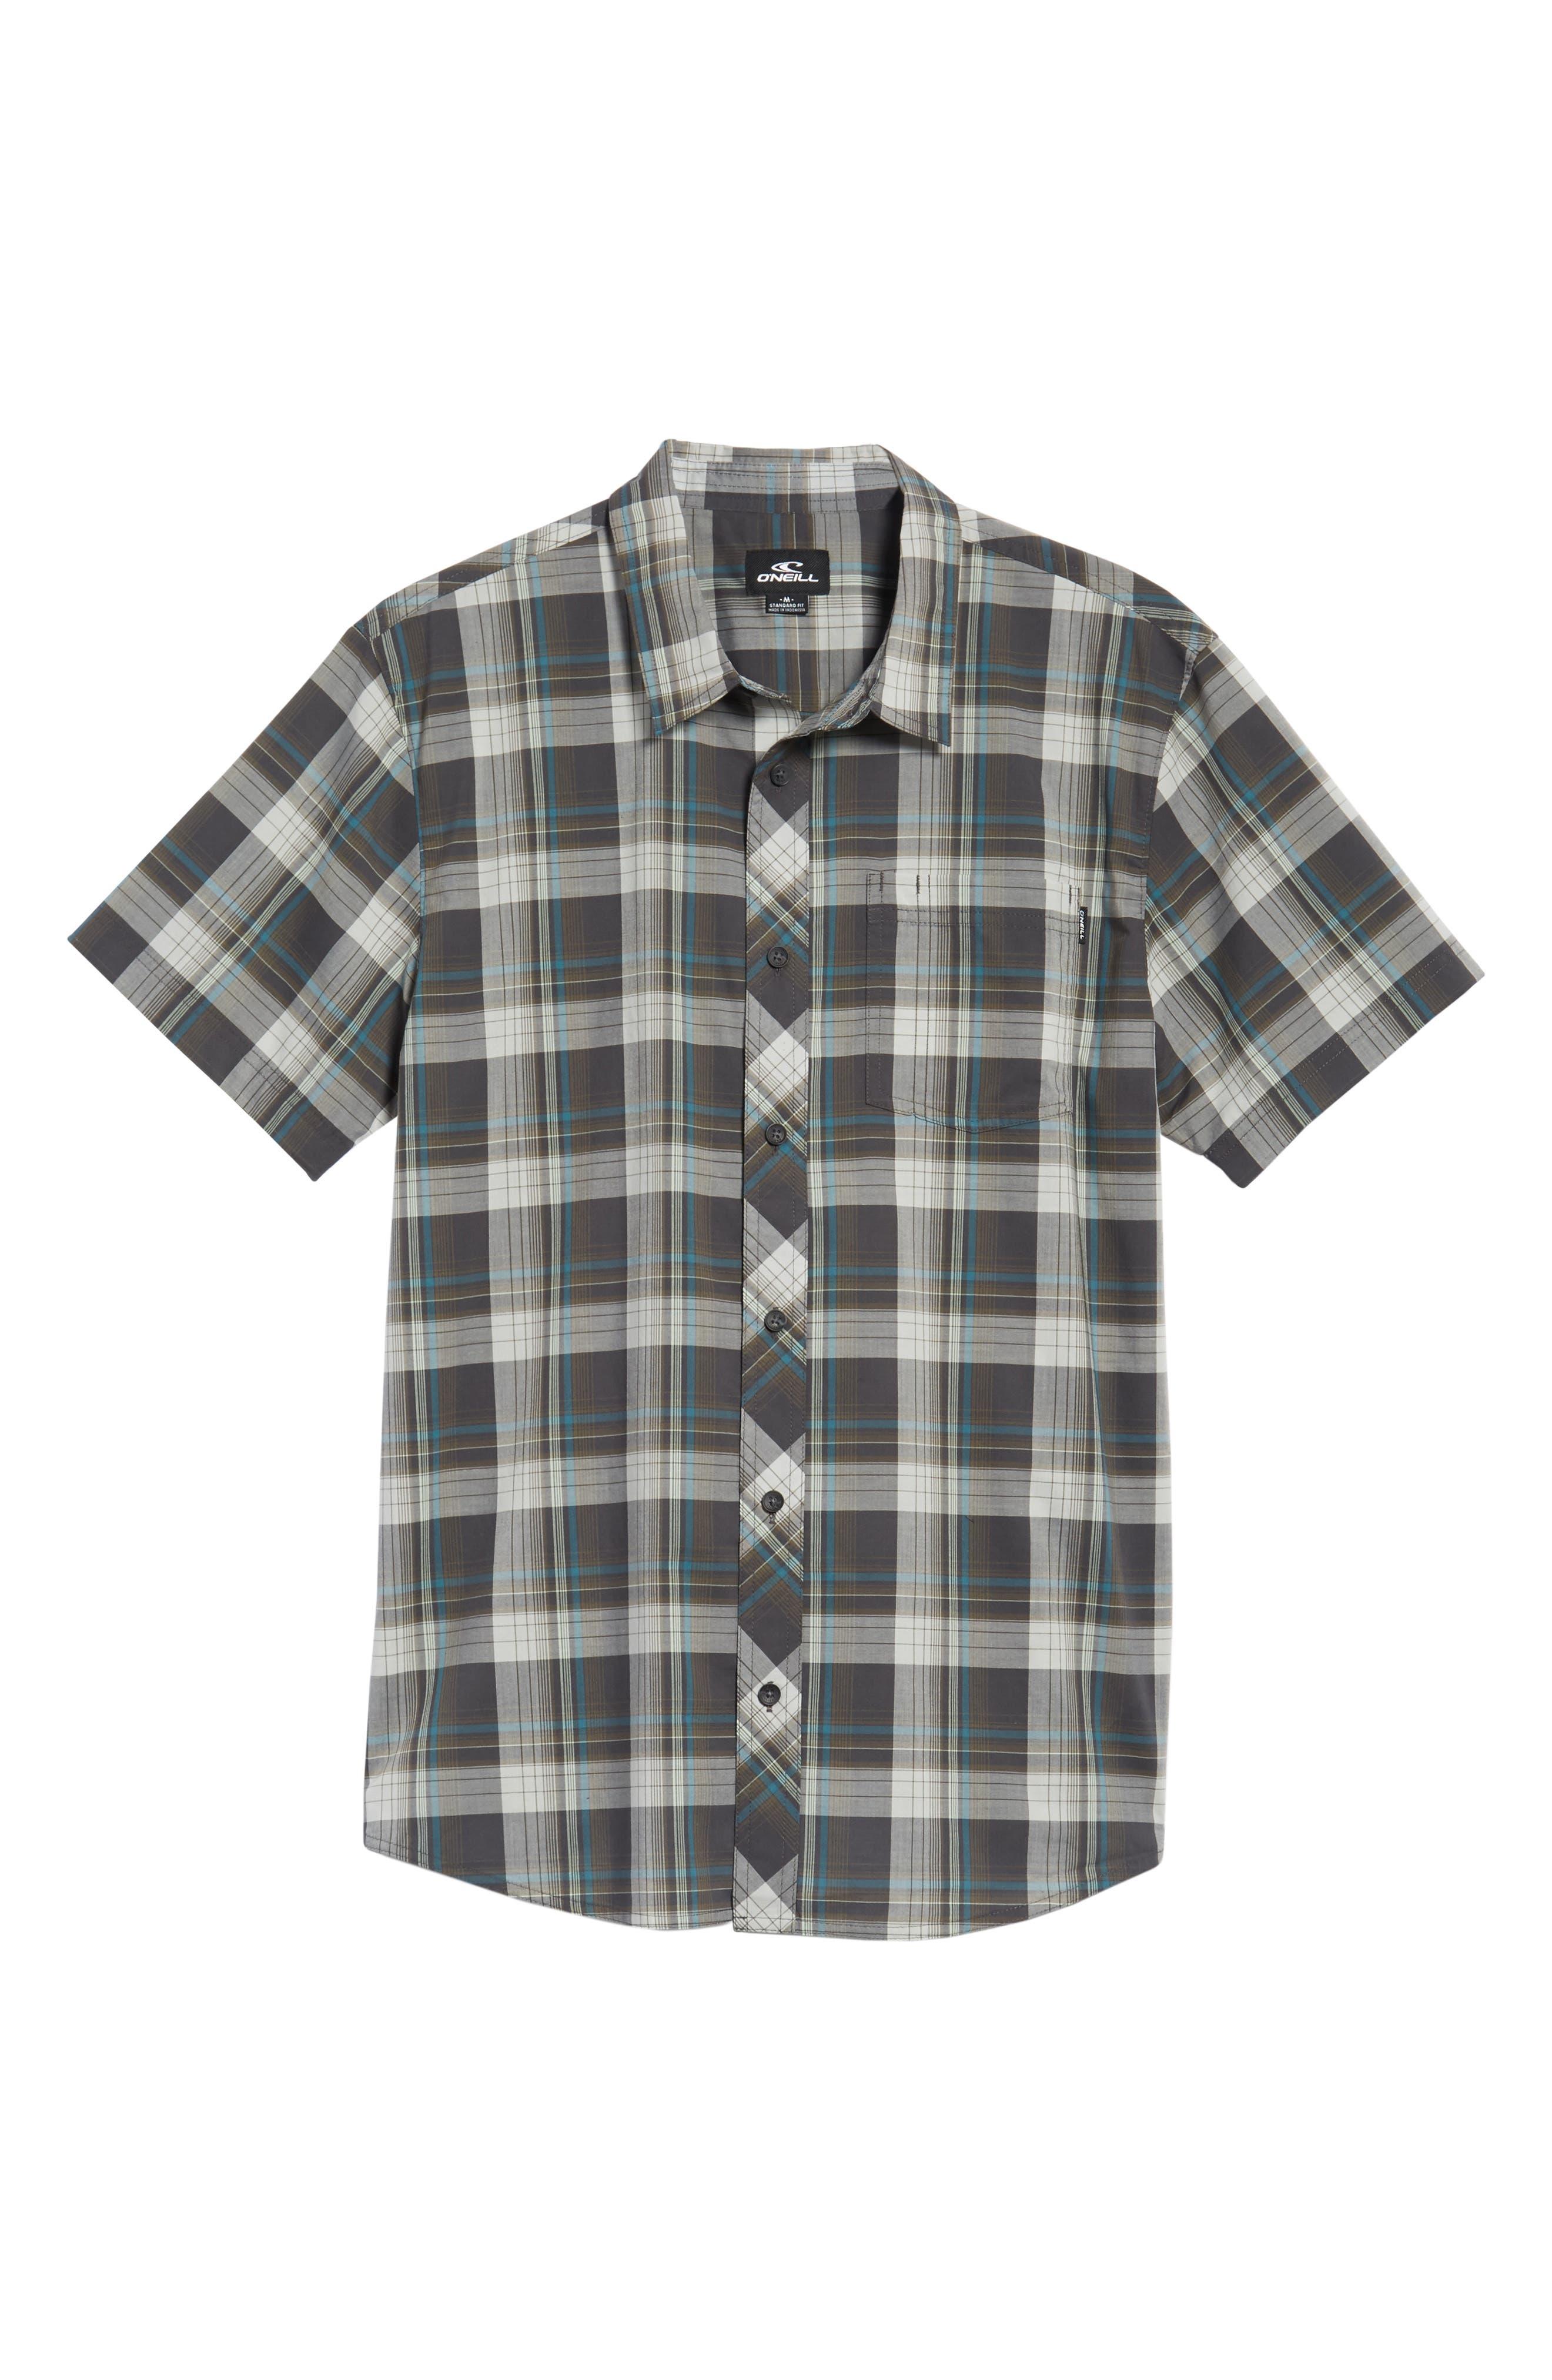 Gentry Short Sleeve Shirt,                             Alternate thumbnail 6, color,                             Asphalt